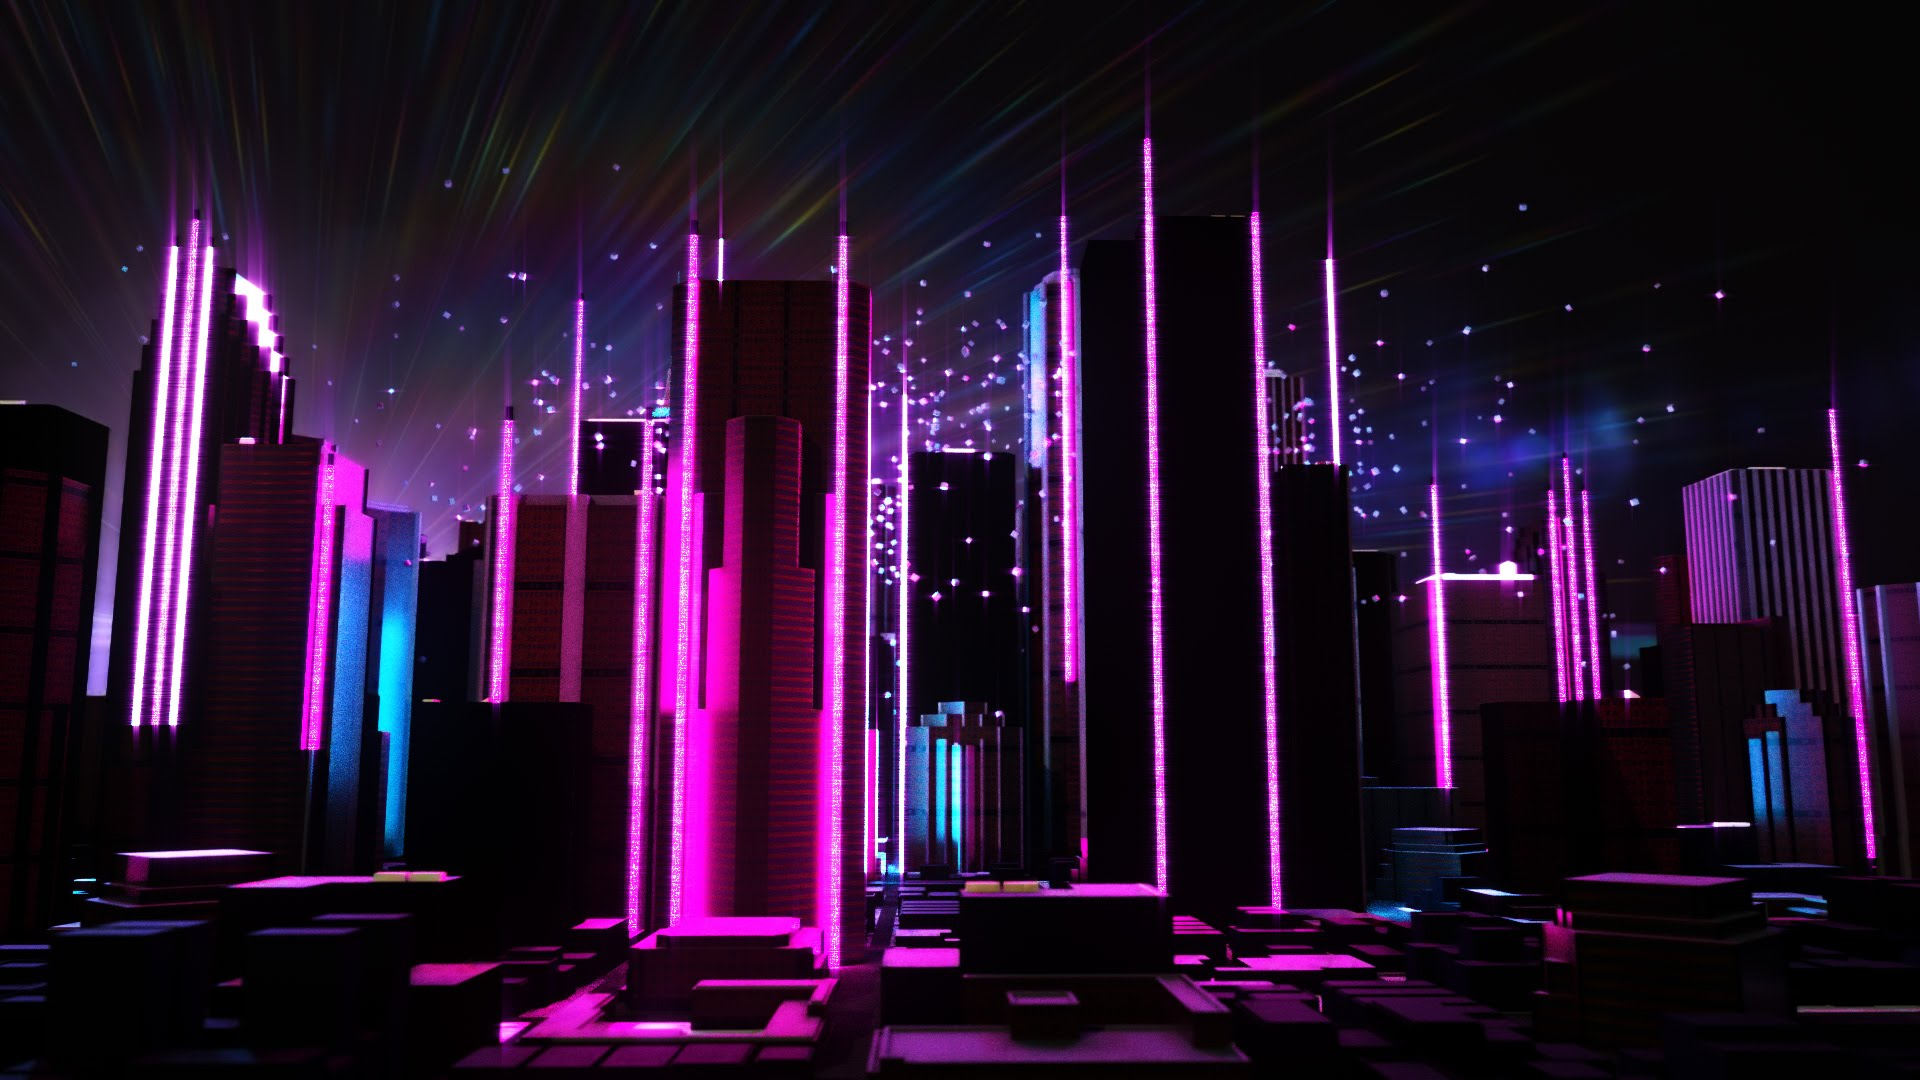 Neon Backgrounds, Compatible - PC, Mobile, Gadgets| 1920x1080 px